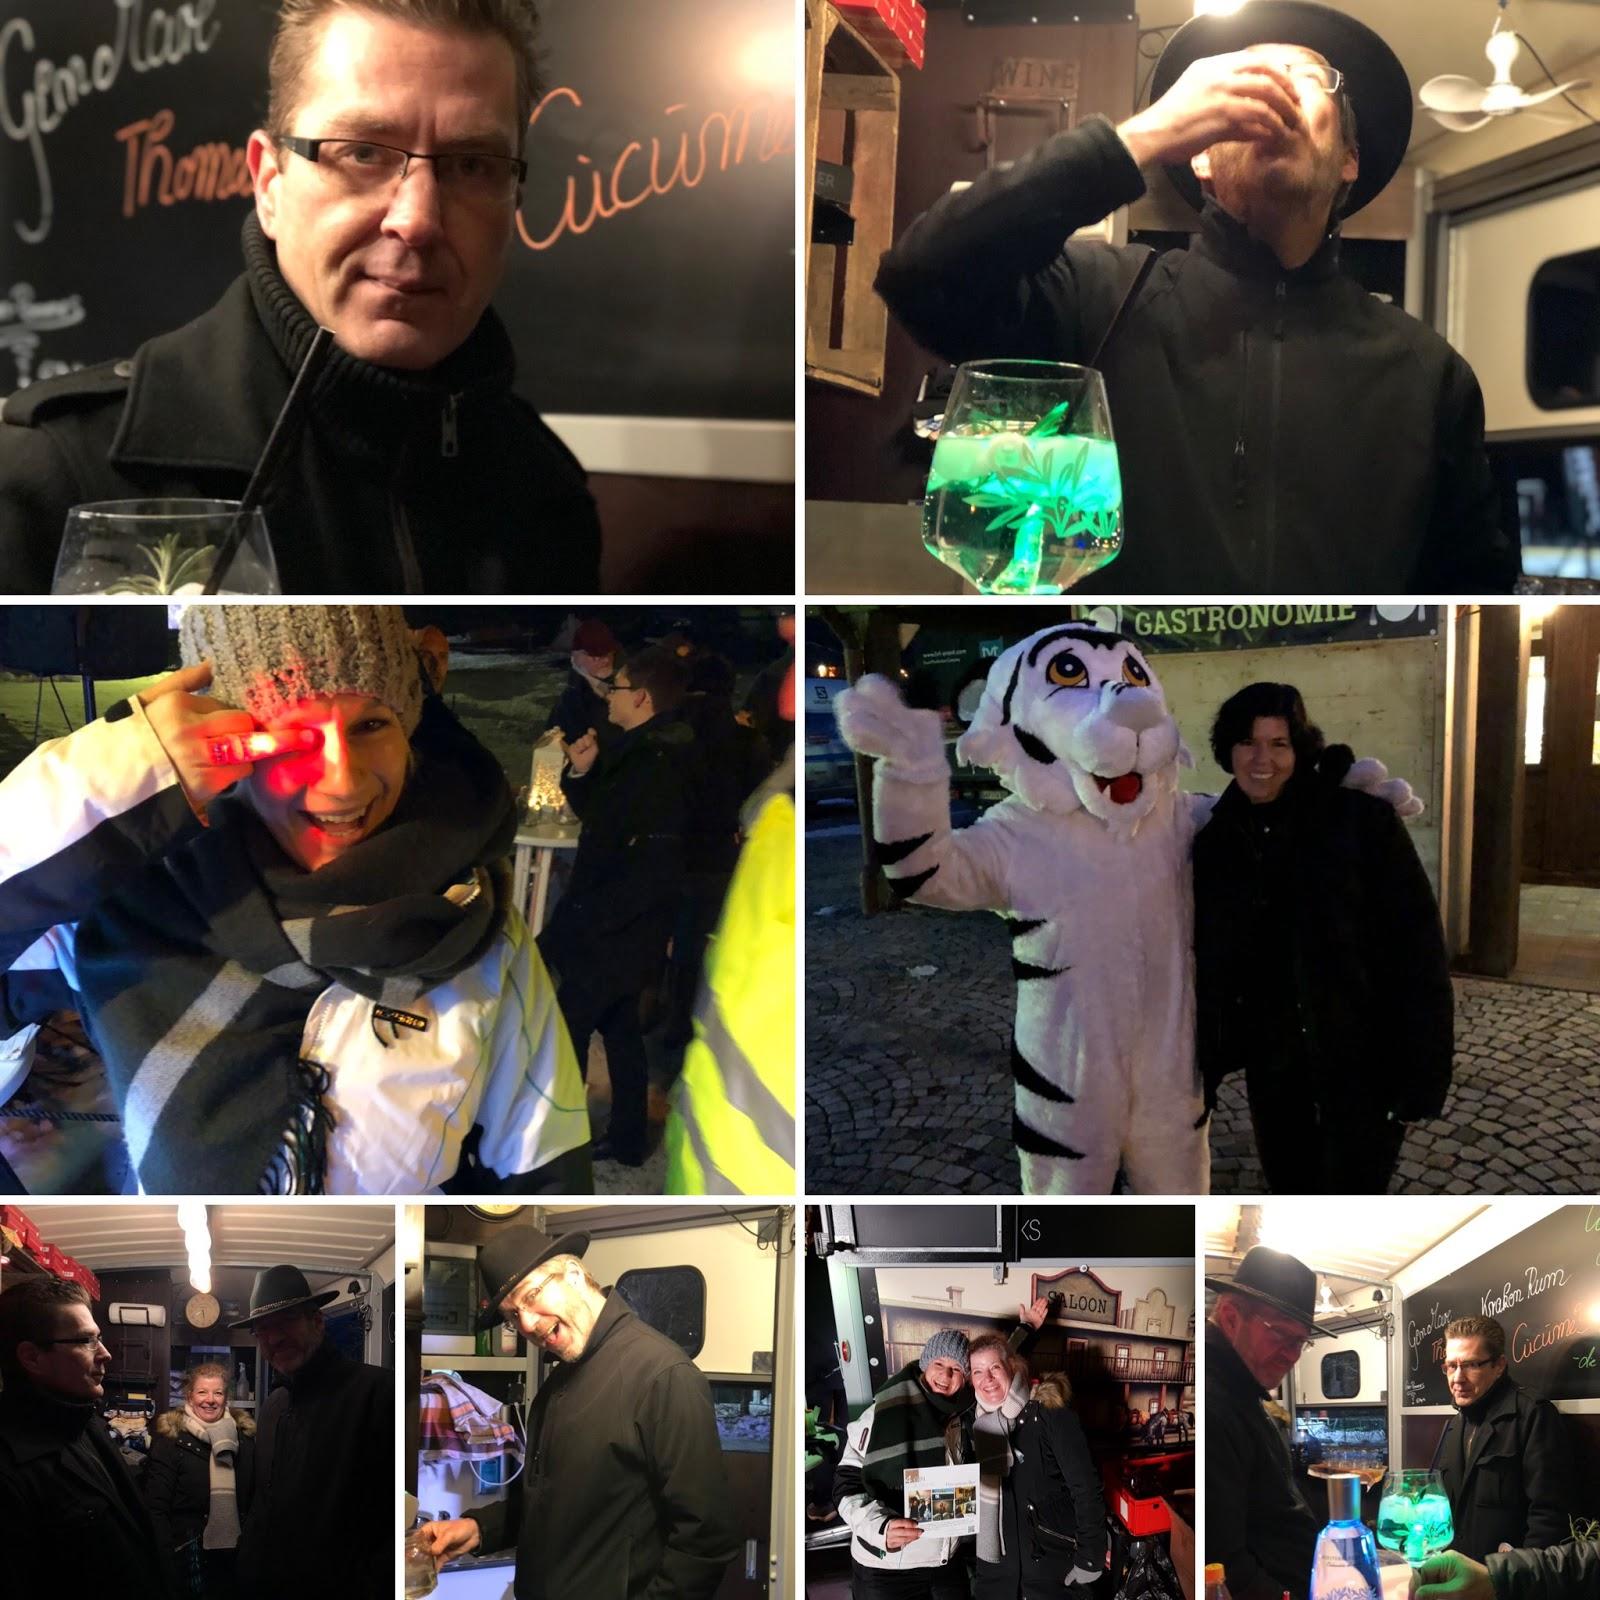 Party, one Team one dream, Team Horseboxbar, the best, 4 Gin and Drinks, Horseboxbar, Event-Bar, mobile Bar, Bayern, Garmisch-Partenkirchen, Gin-Bar, Oberammergau, König-Ludwig-Lauf by Uschi Glas 4 weddings and events